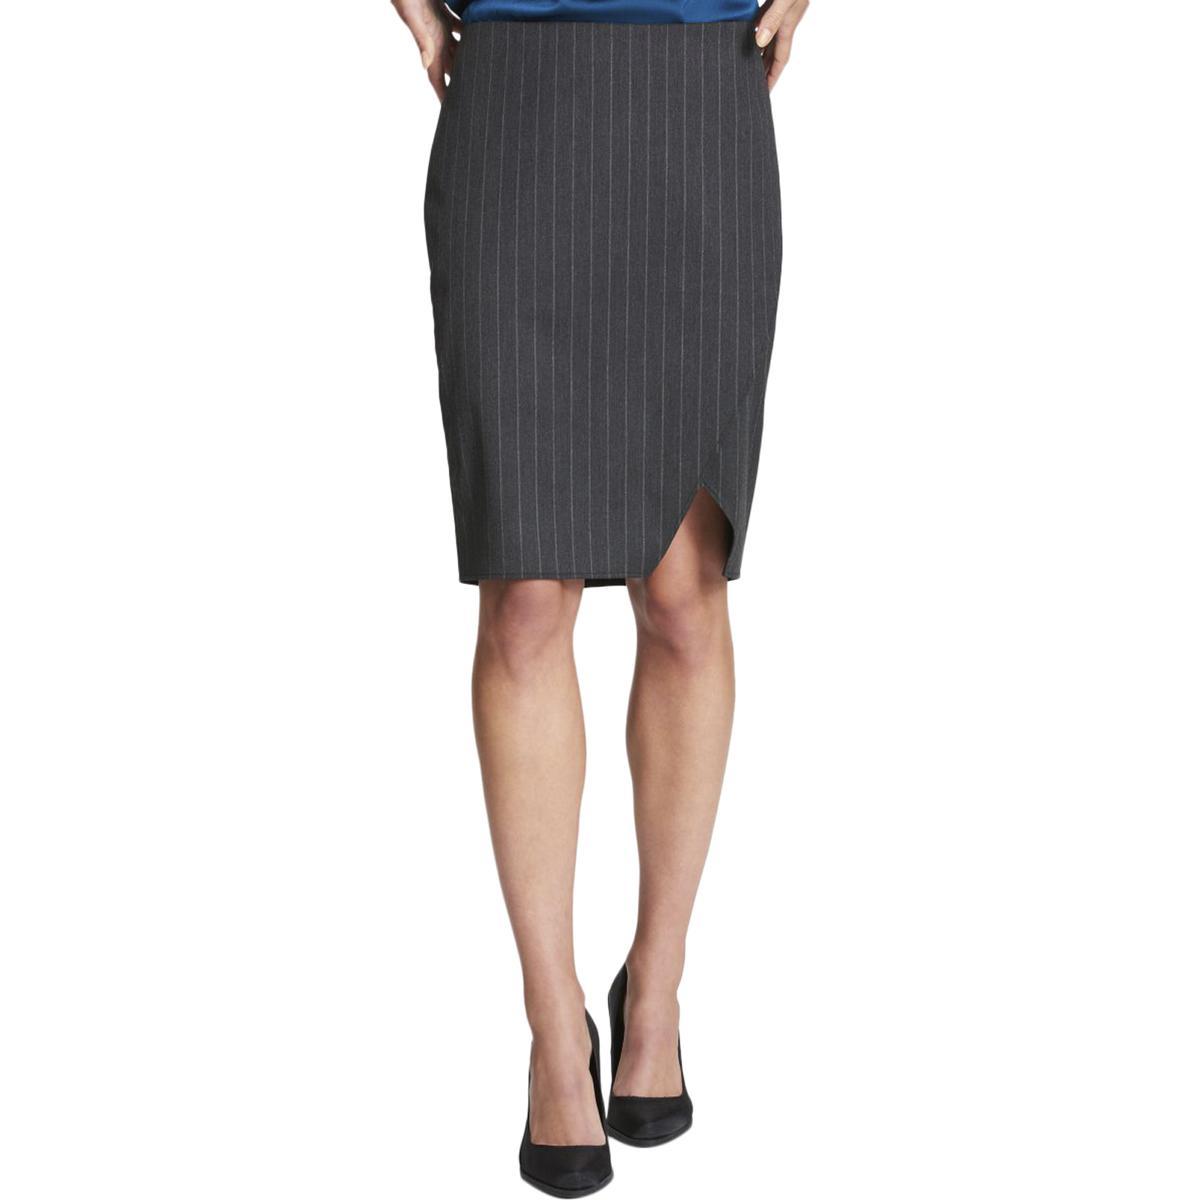 9d8324b35 Details about DKNY Womens Professional Knee-Length Pinstripe Pencil Skirt  BHFO 1515